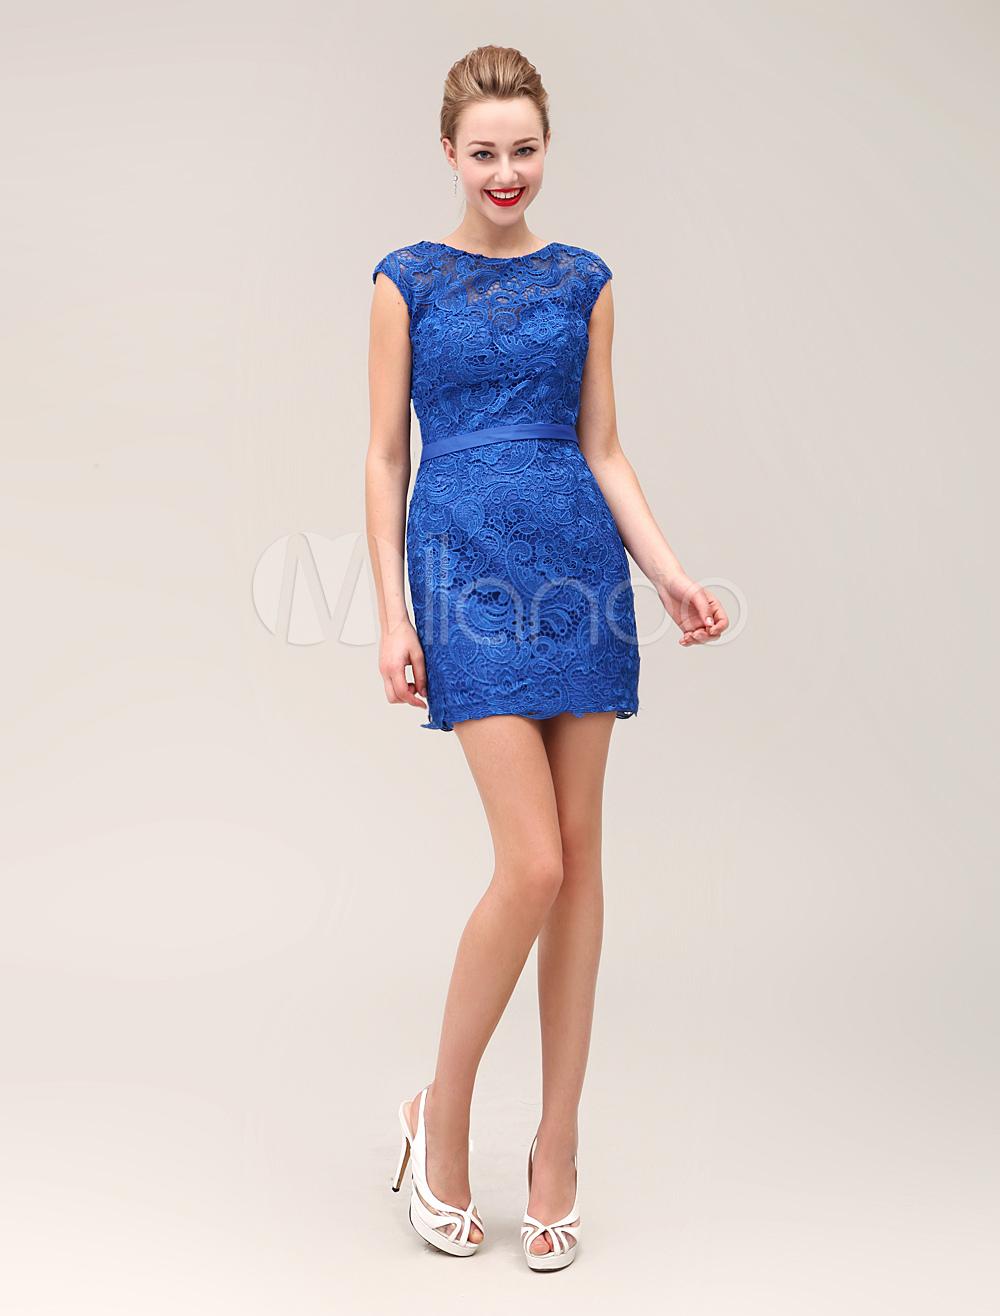 Lace Jewel Neck Sheath Lovely Belt Shaping Short Cocktail Dress With Stylish Cap Sleeve Milanoo